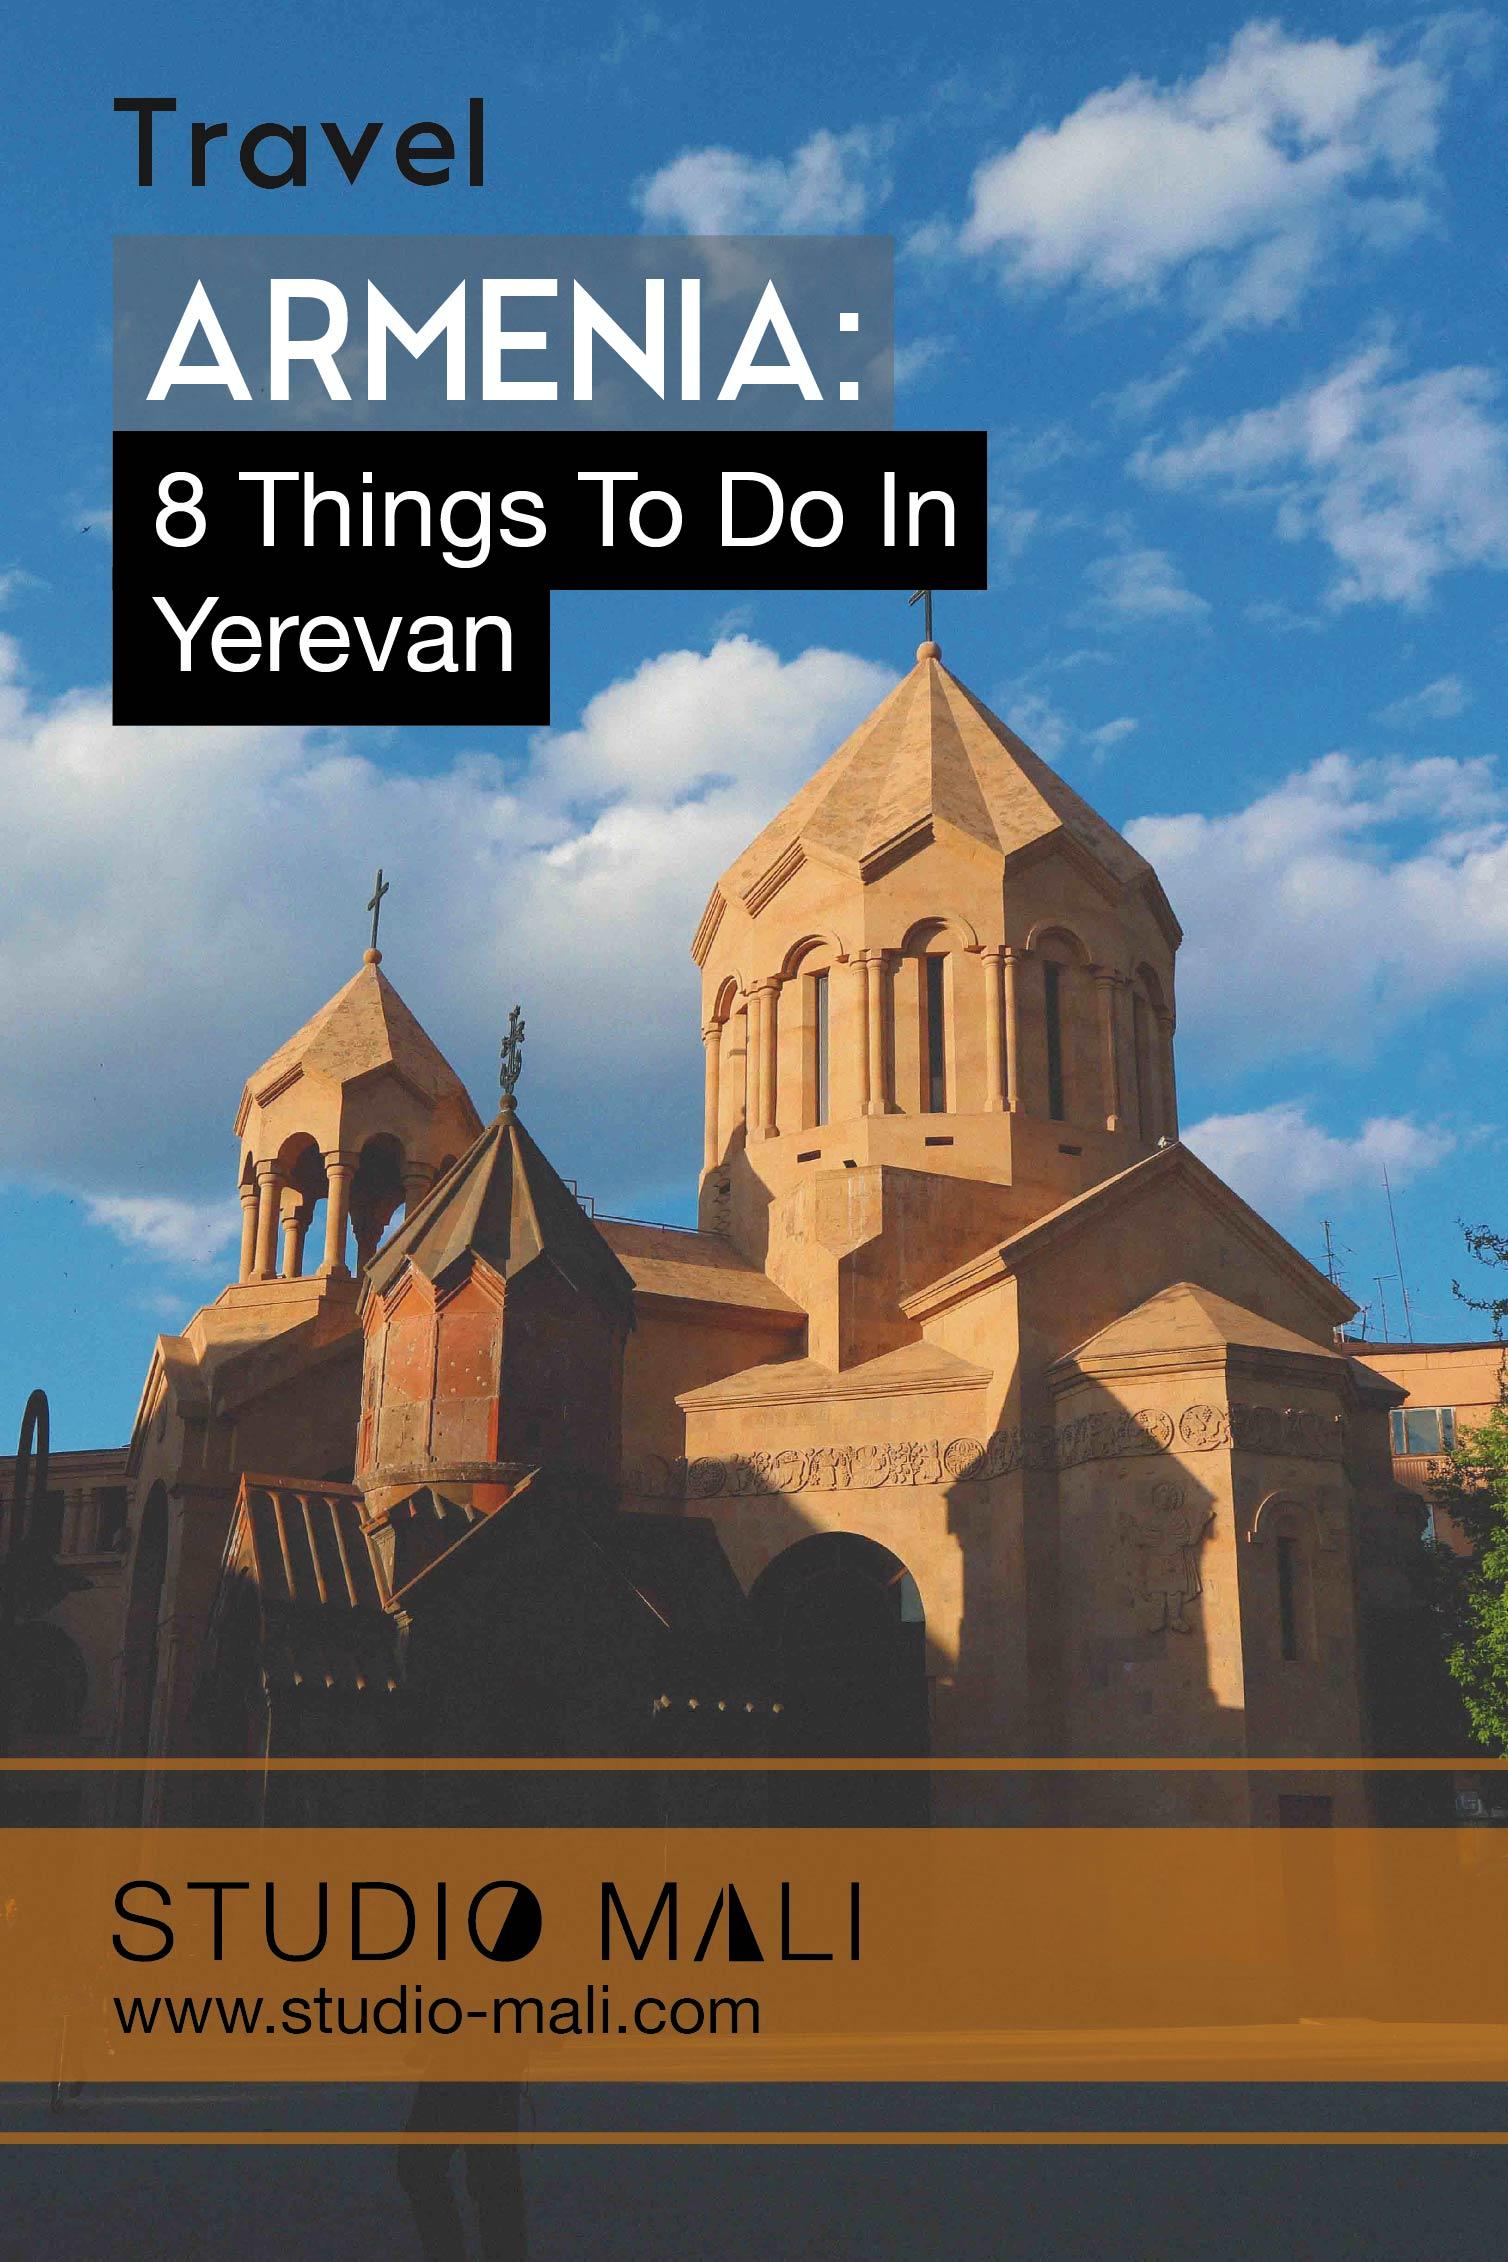 Armenia - 8 Things To Do In Yerevan, by Studio Mali.jpg